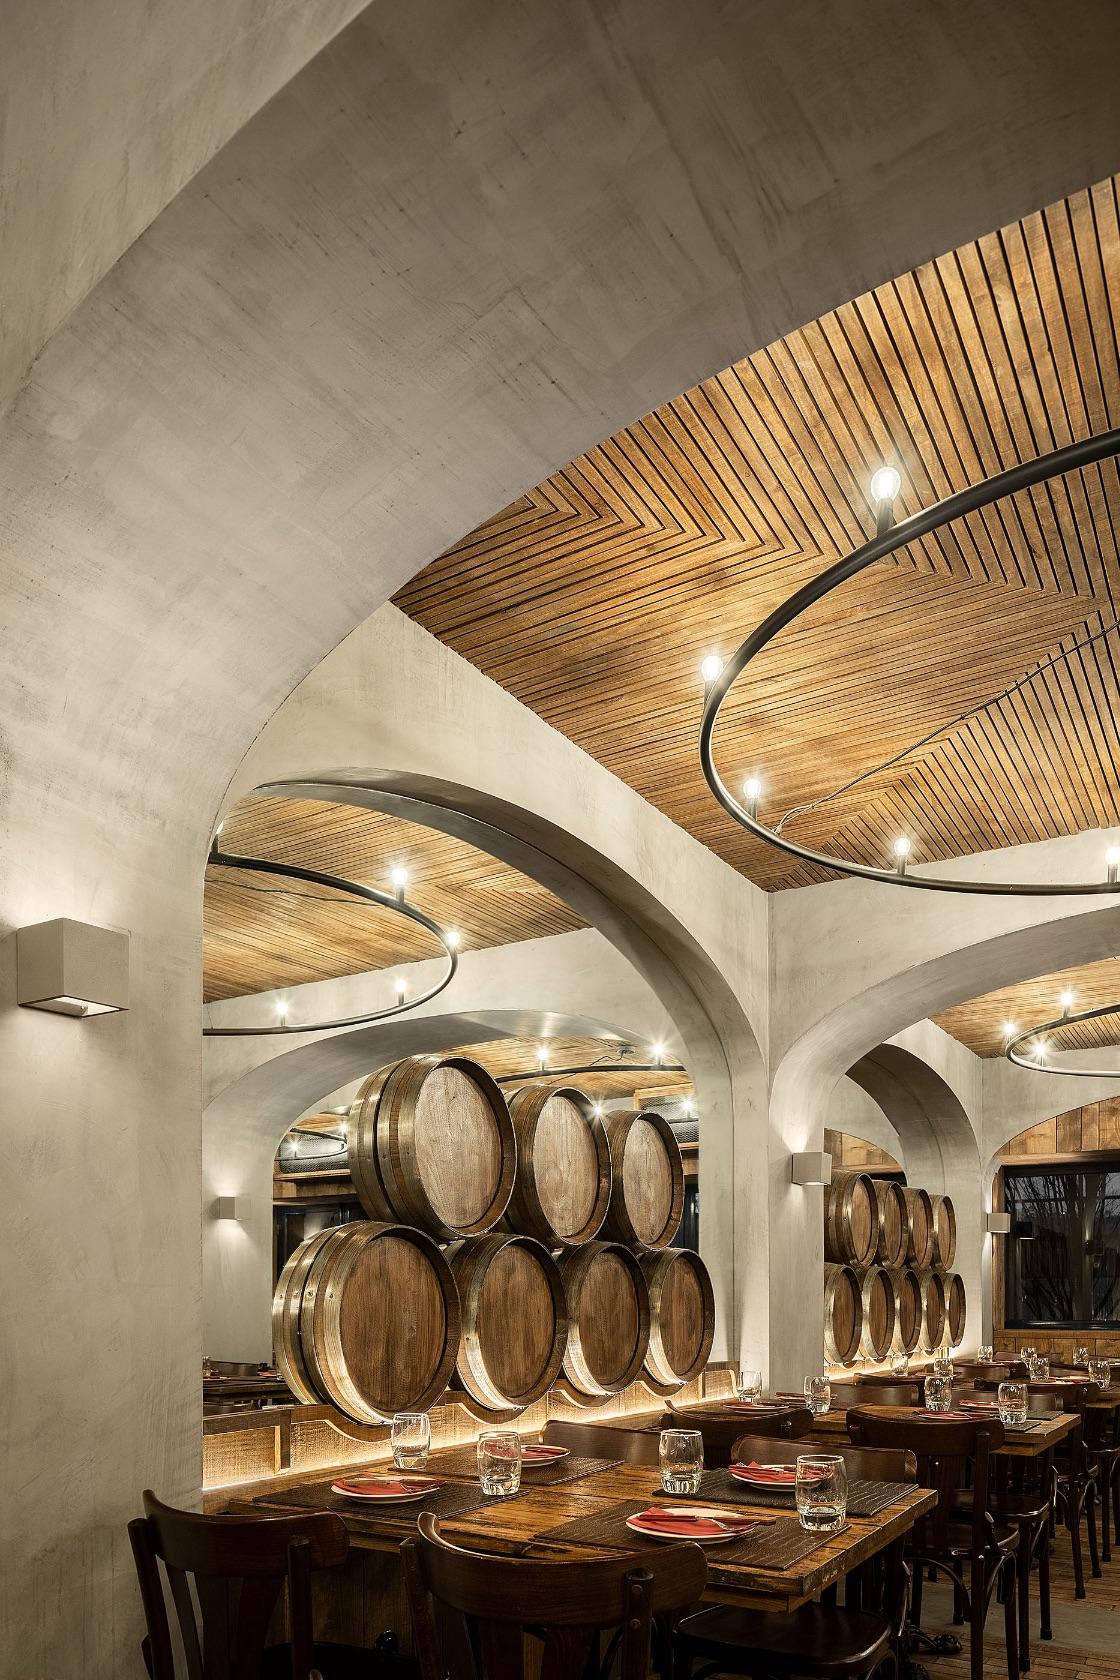 12_BARRIL Restaurant_PAULO MERLINI Architects_Inspirationist